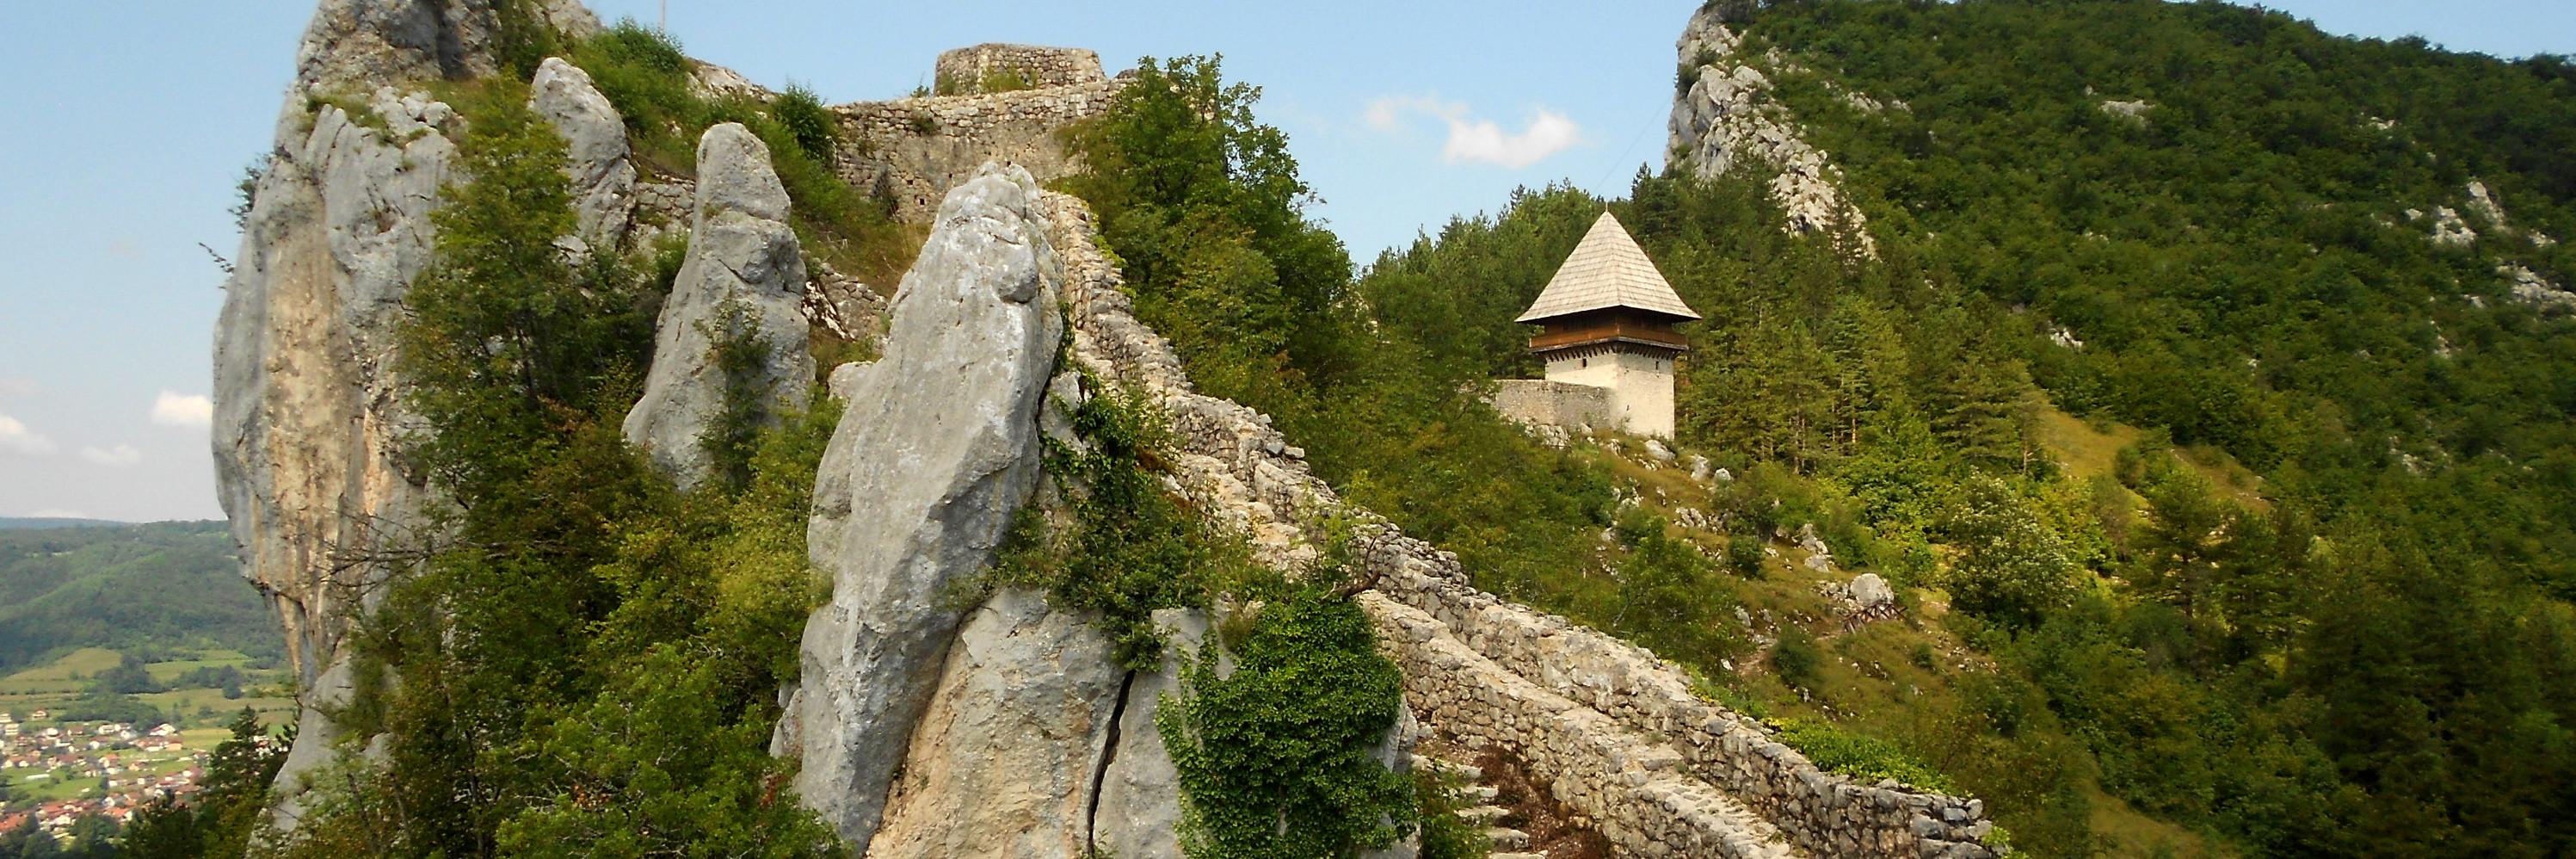 Крепость Ключ